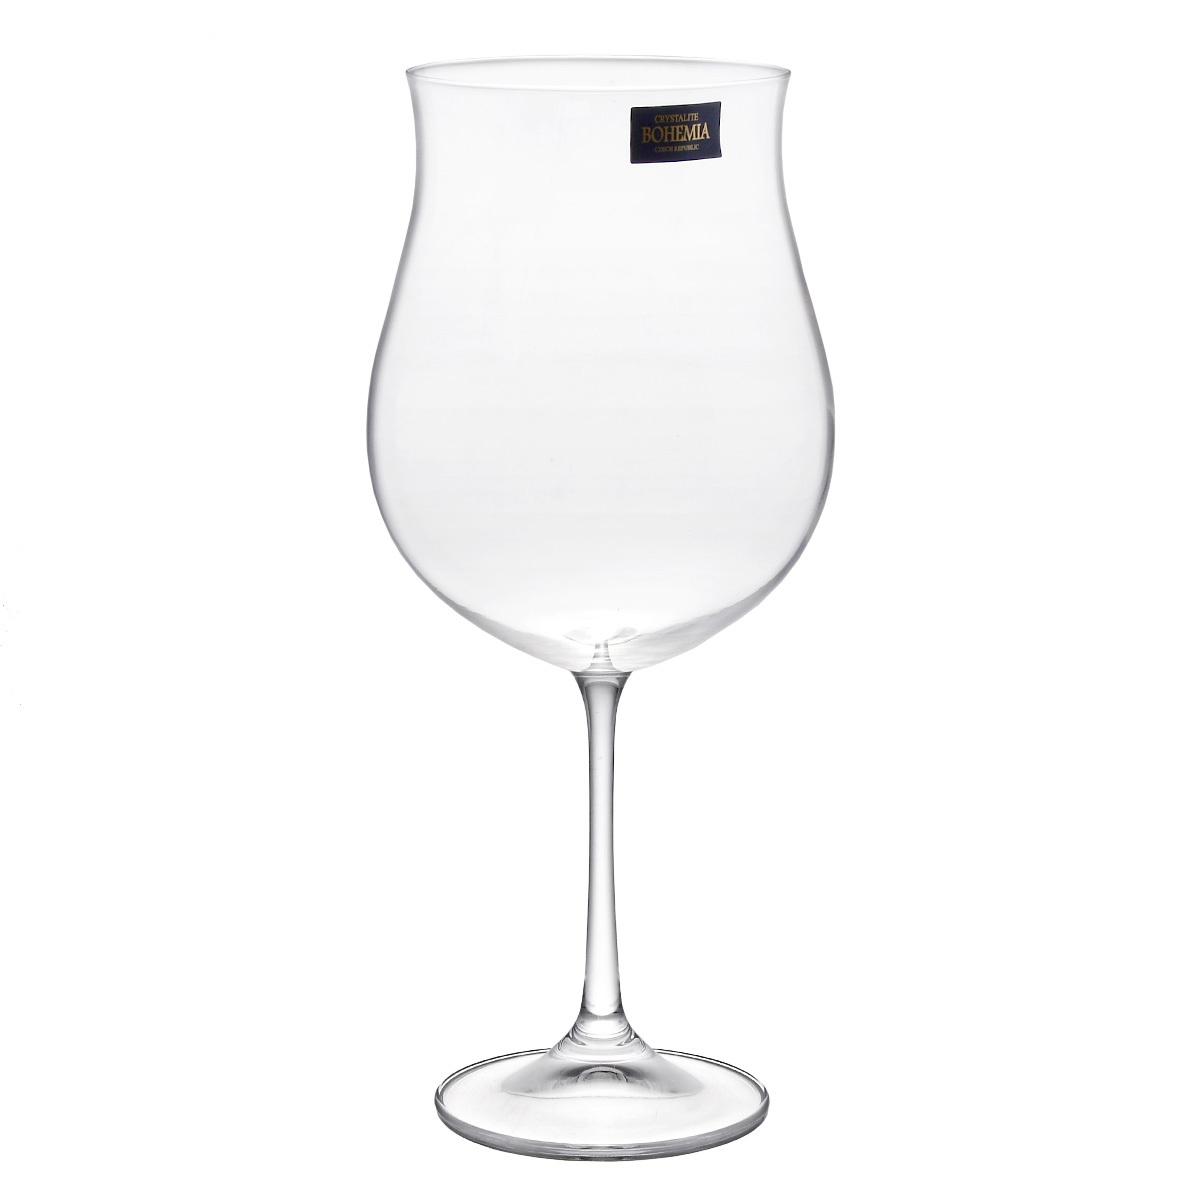 Набор из 6 бокалов для вина Crystalite Bohemia Safia, 640 мл набор бокалов для вина crystalite bohemia набор бокалов для вина